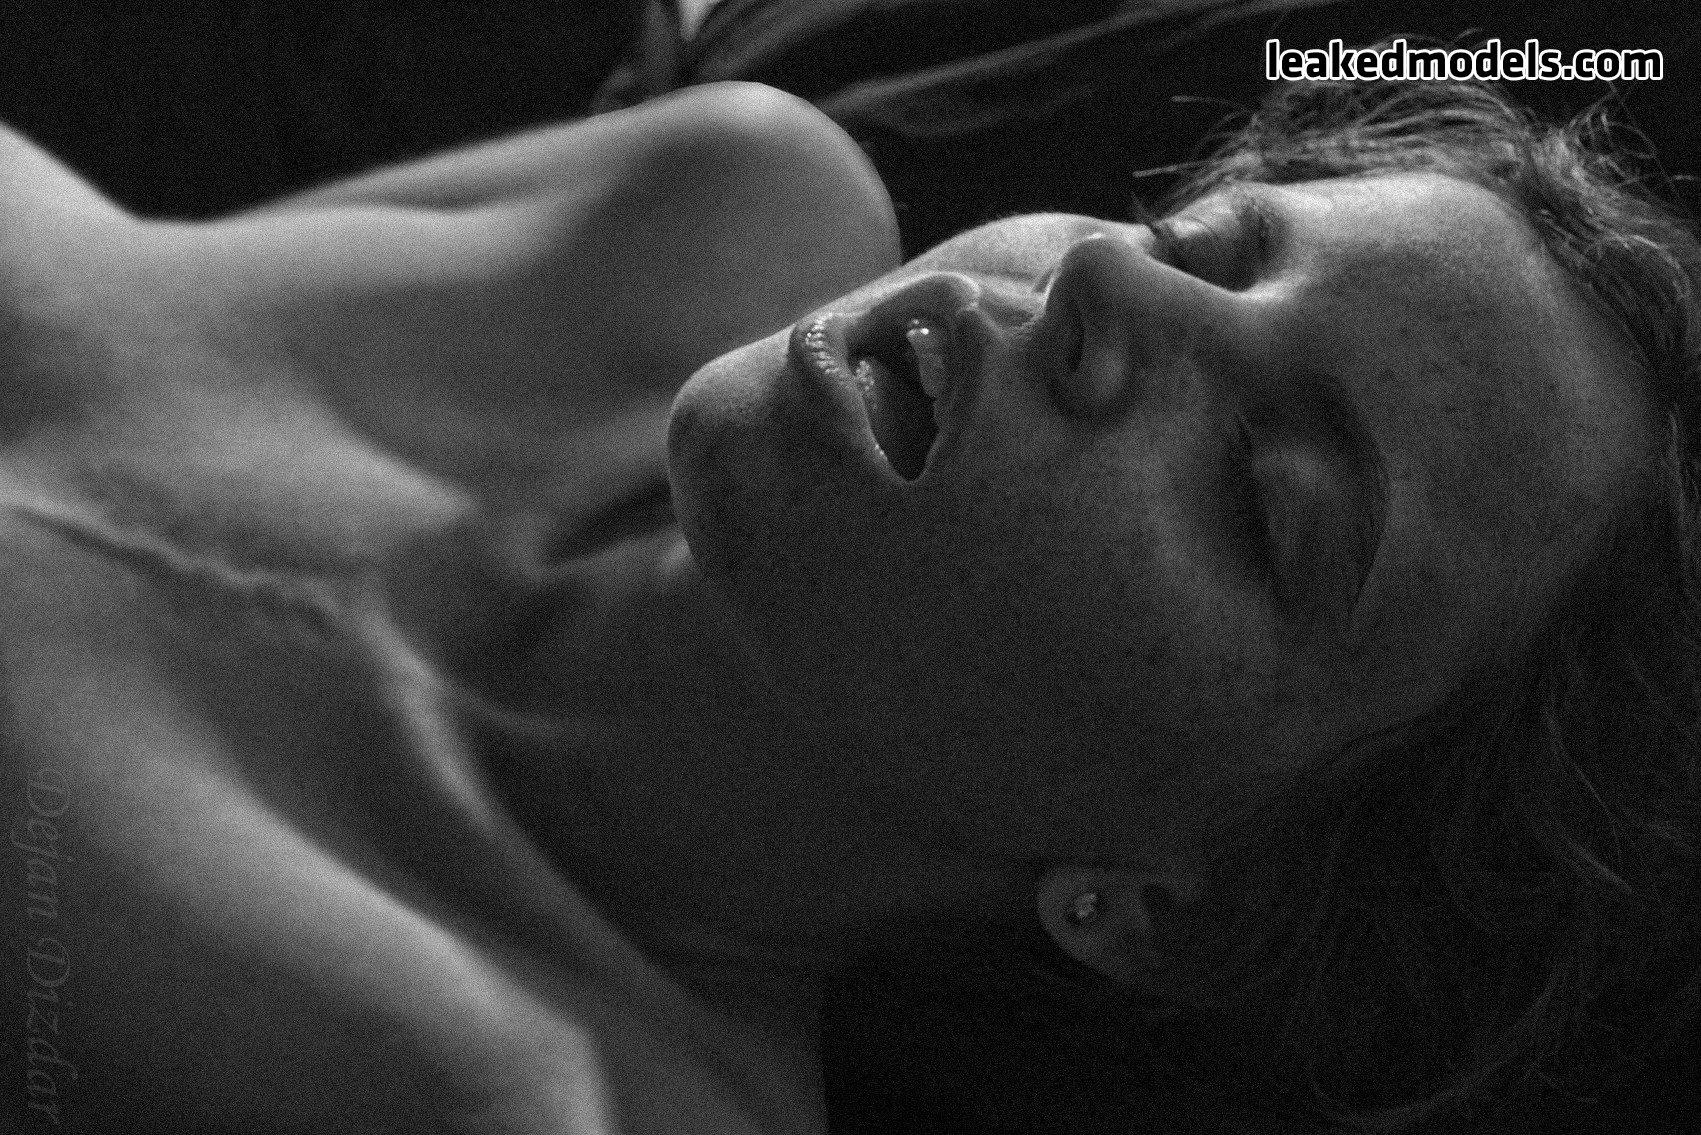 roza tselniker leaked nude leakedmodels.com 0044 - Roza Tselniker Instagram Nude Leaks (27 Photos)